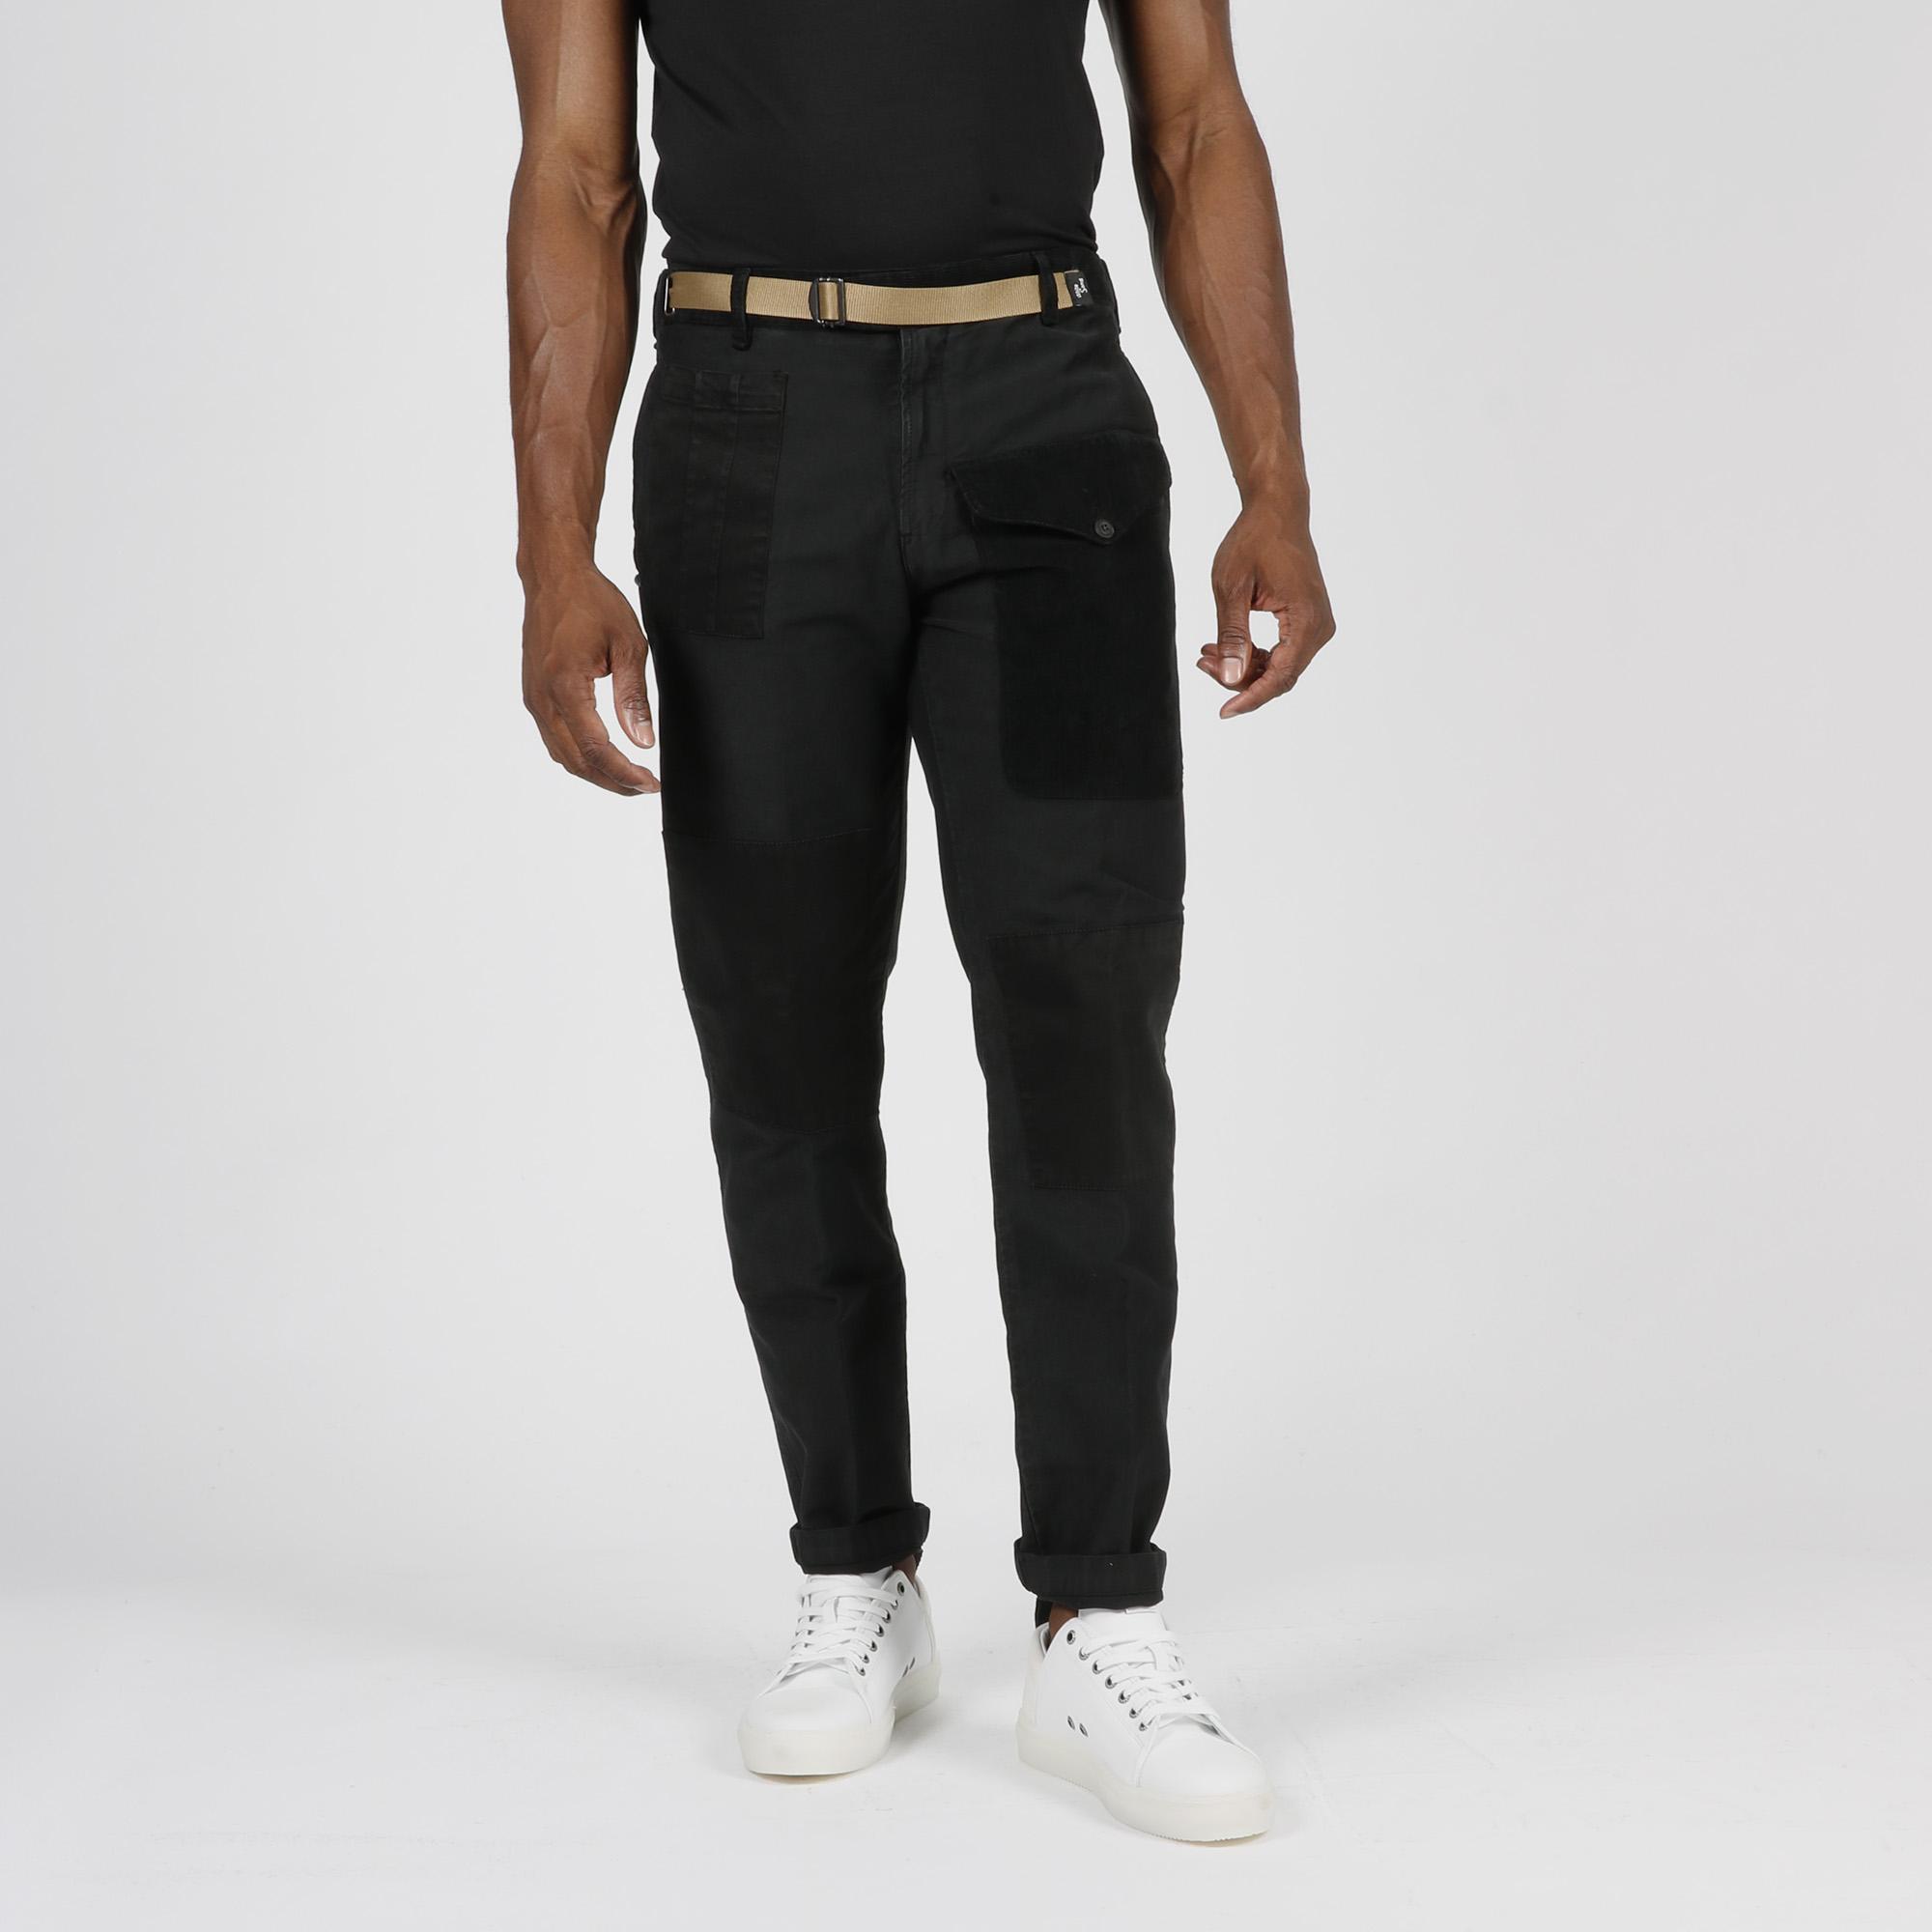 Pantalone tascone velluto - Nero